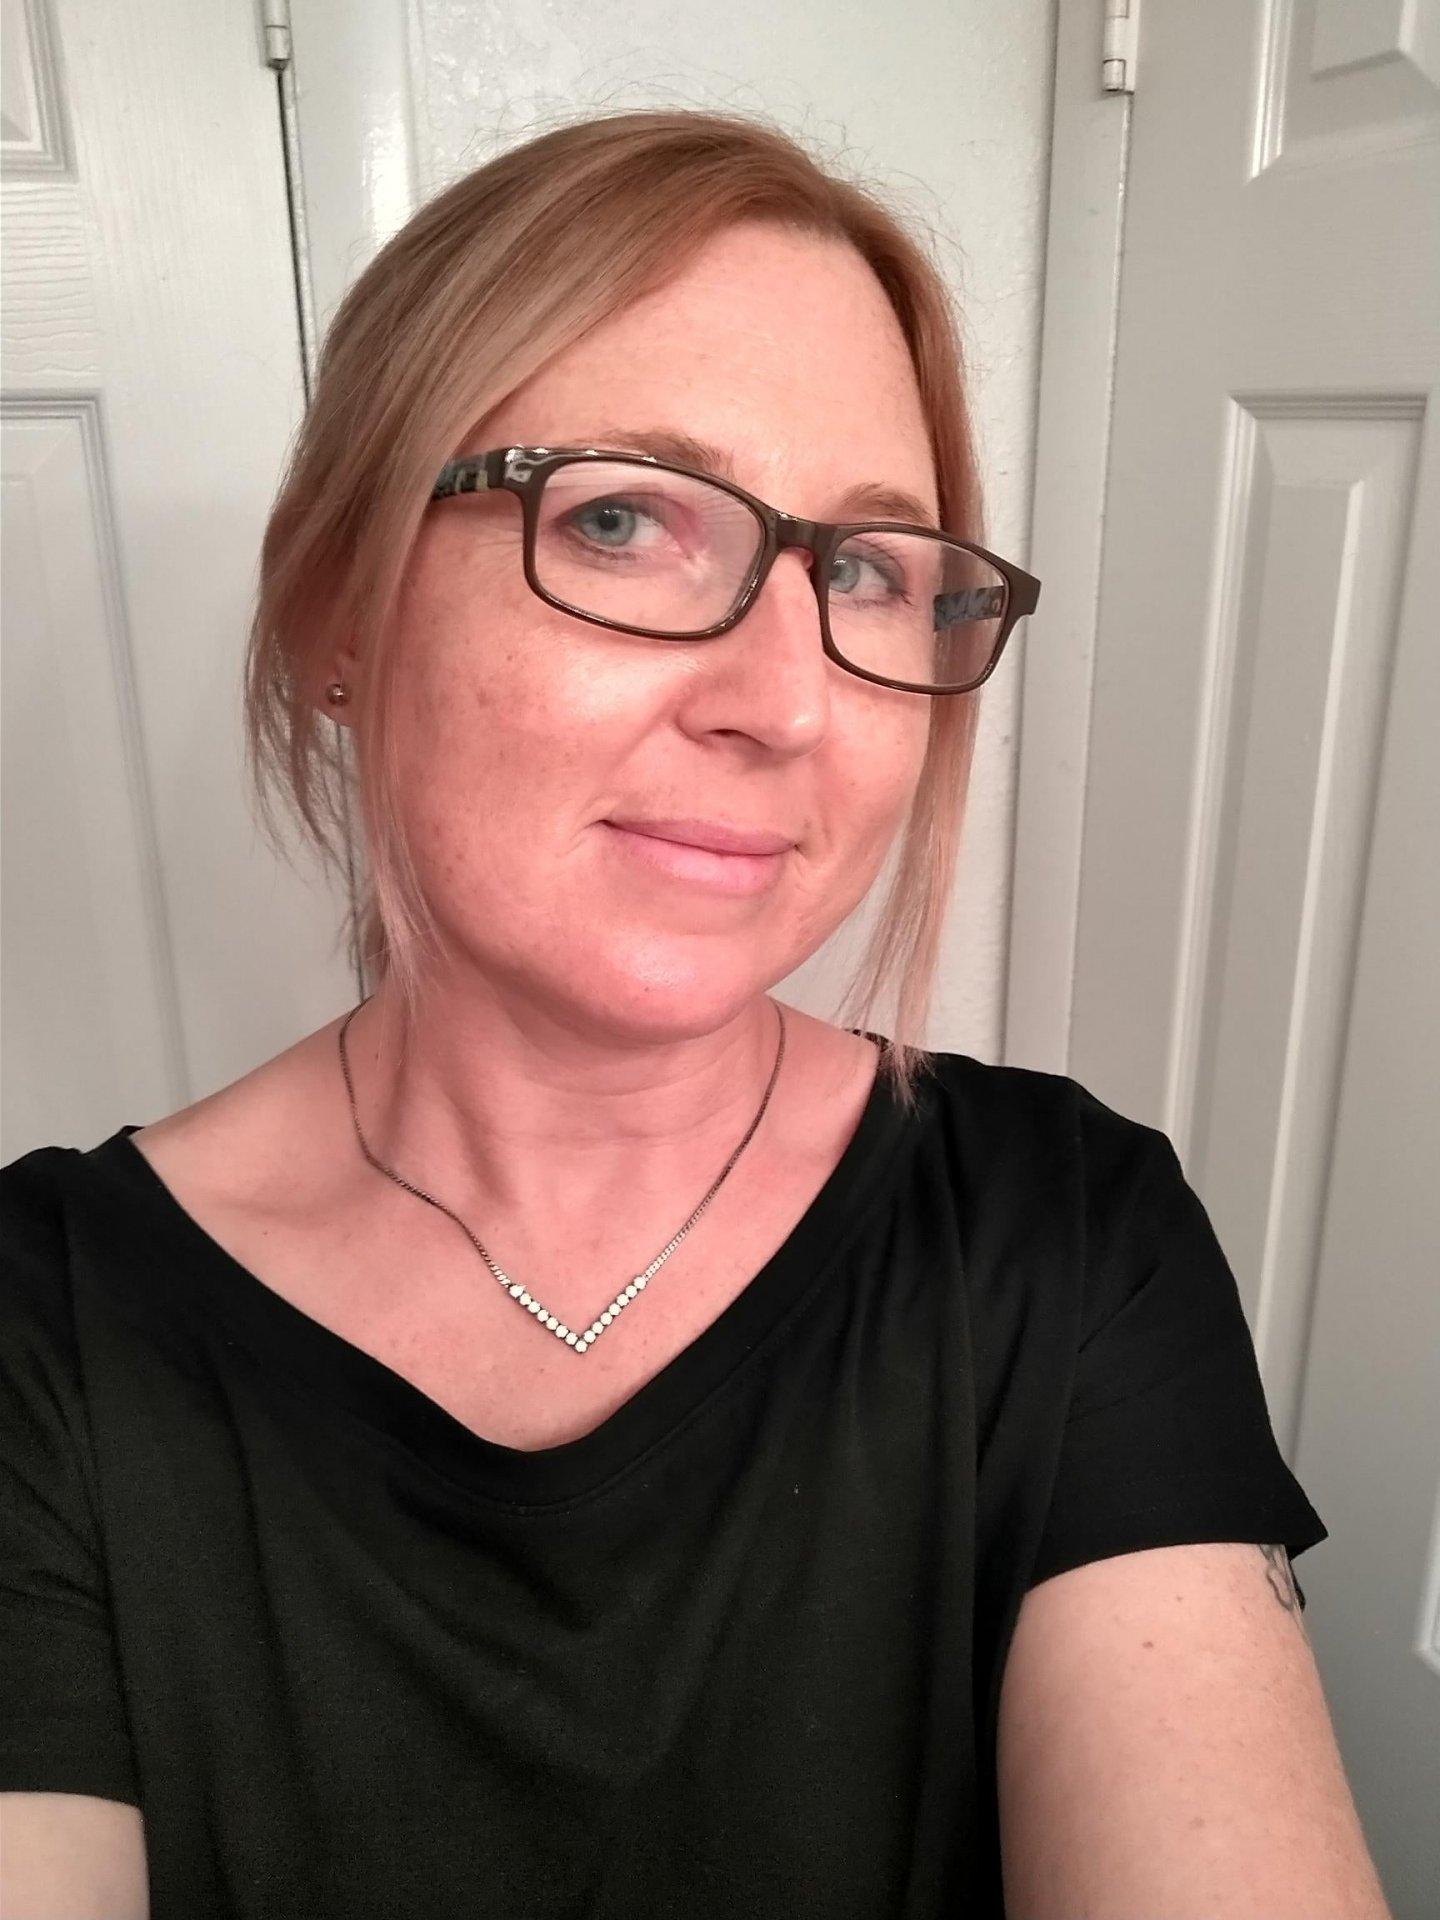 Jennifer Bailey from Fife,United Kingdom